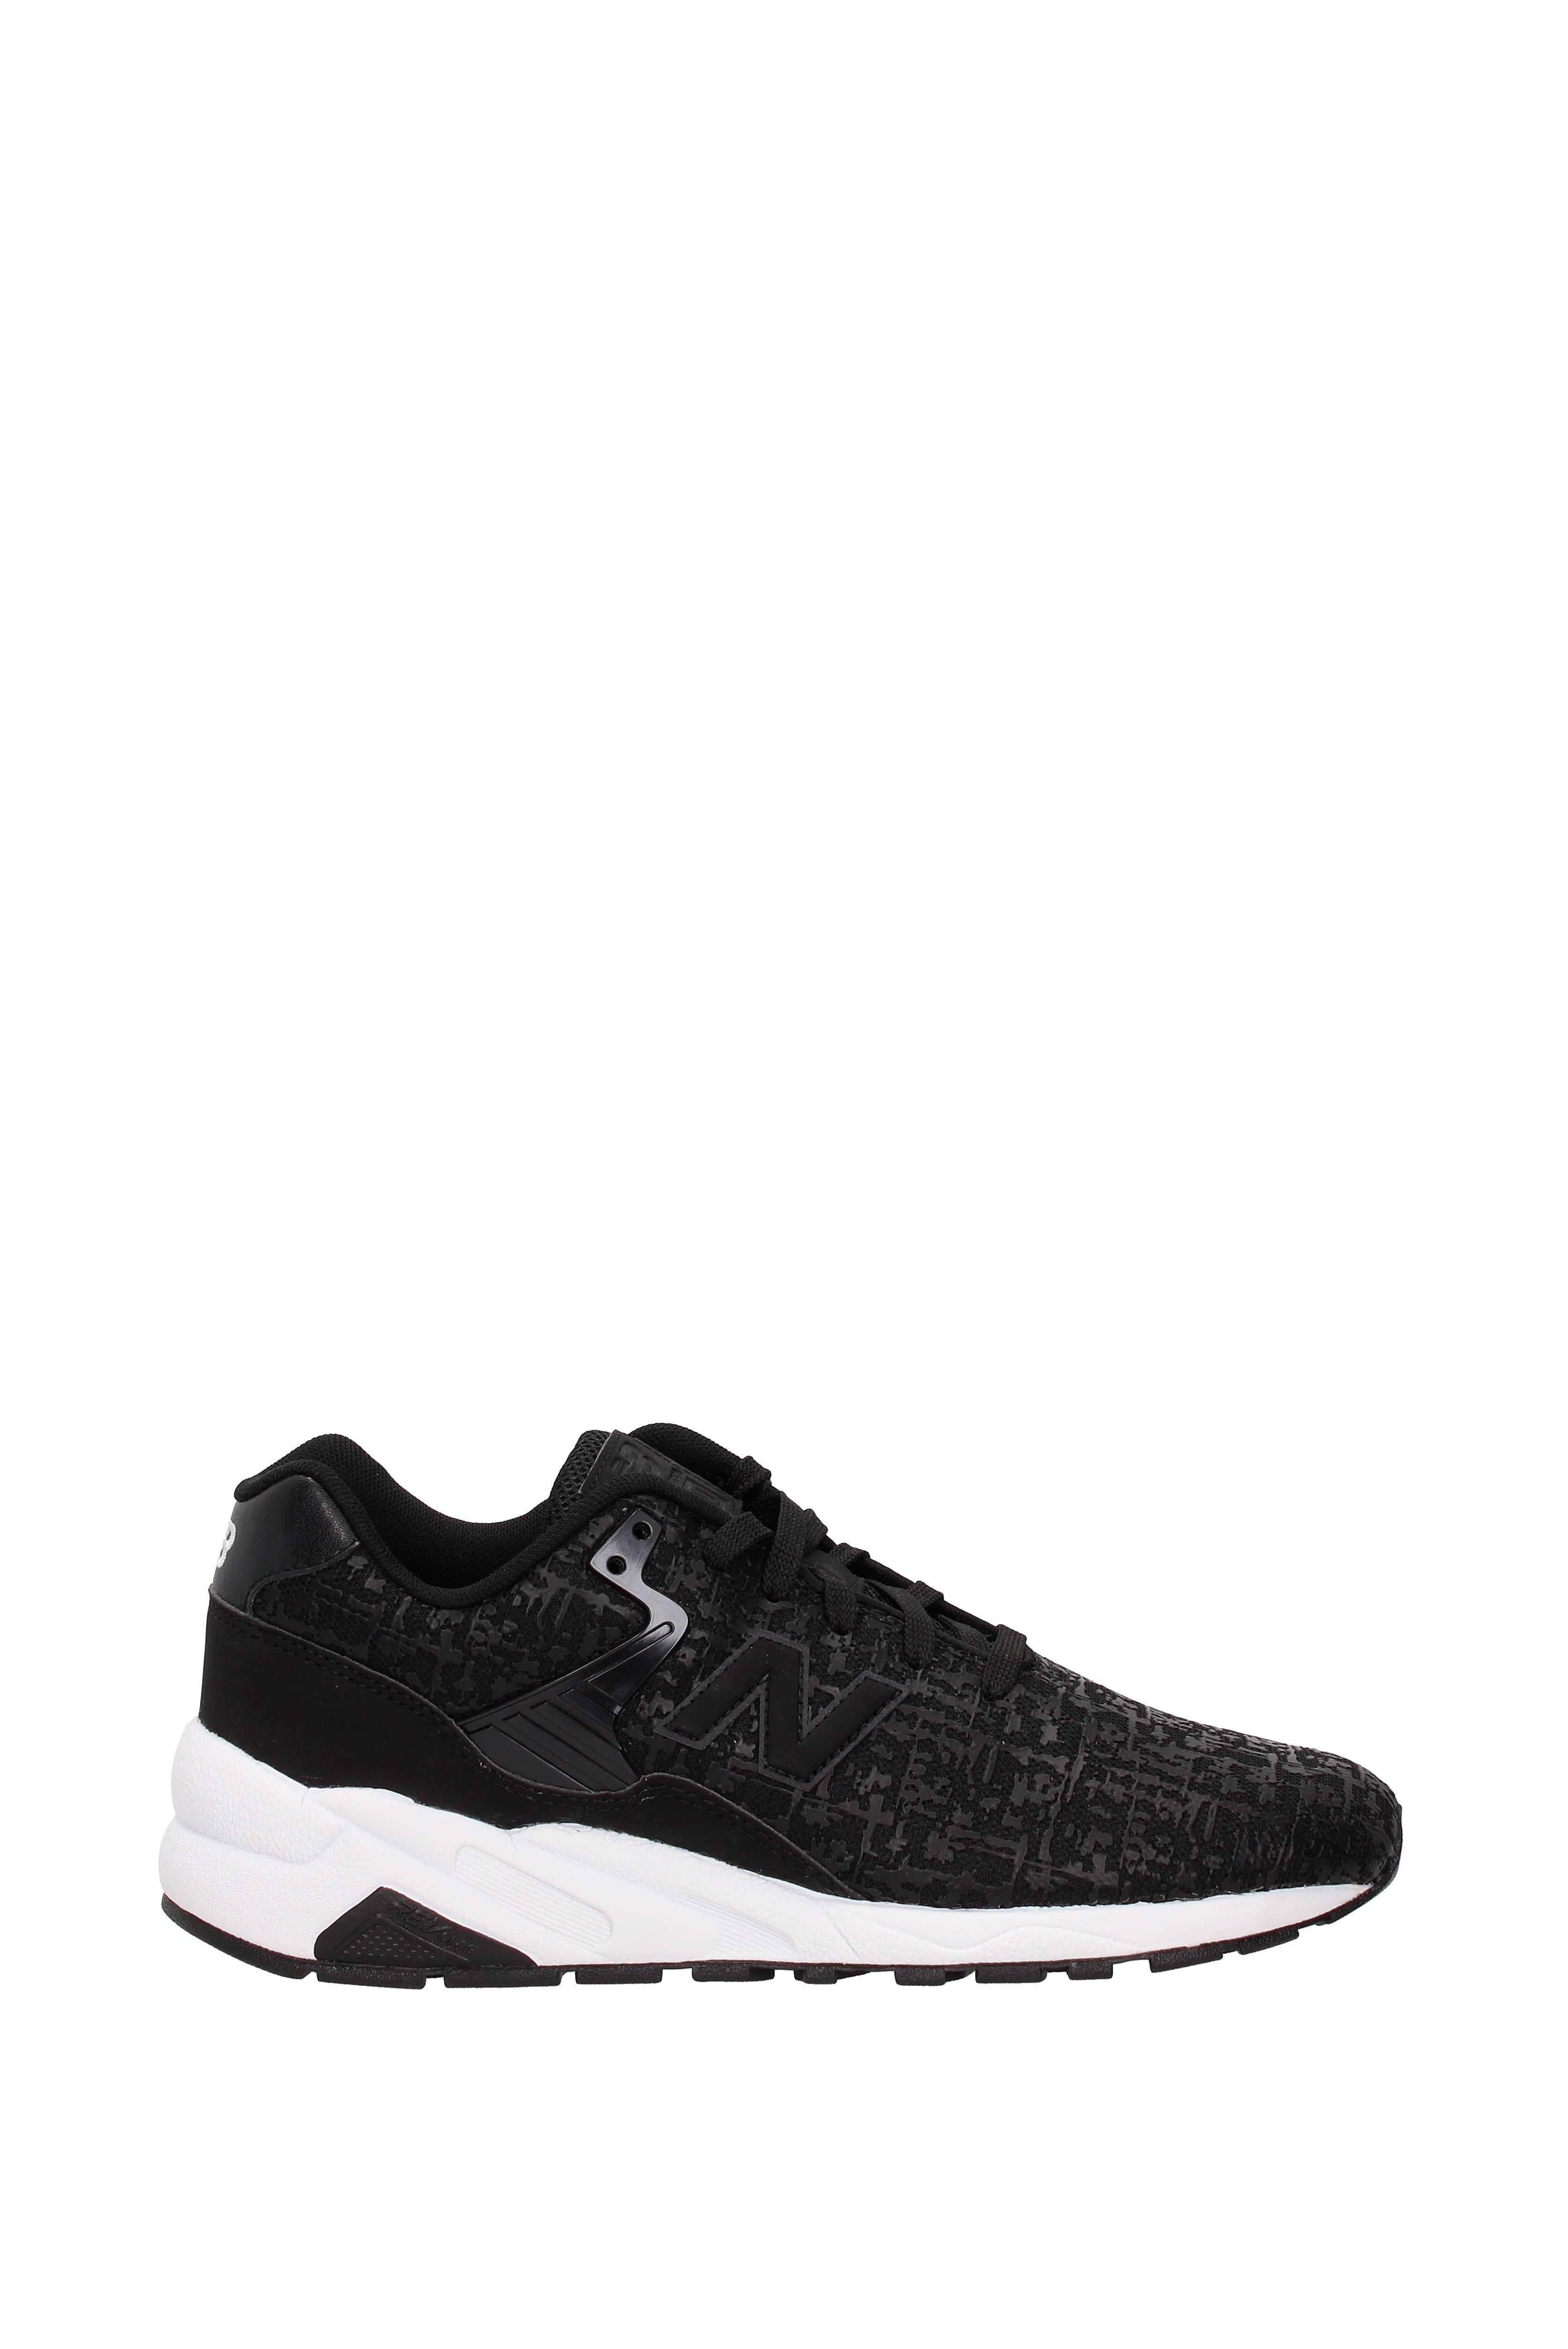 Sneakers New Balance Uomo Pelle PELLEMRL247L